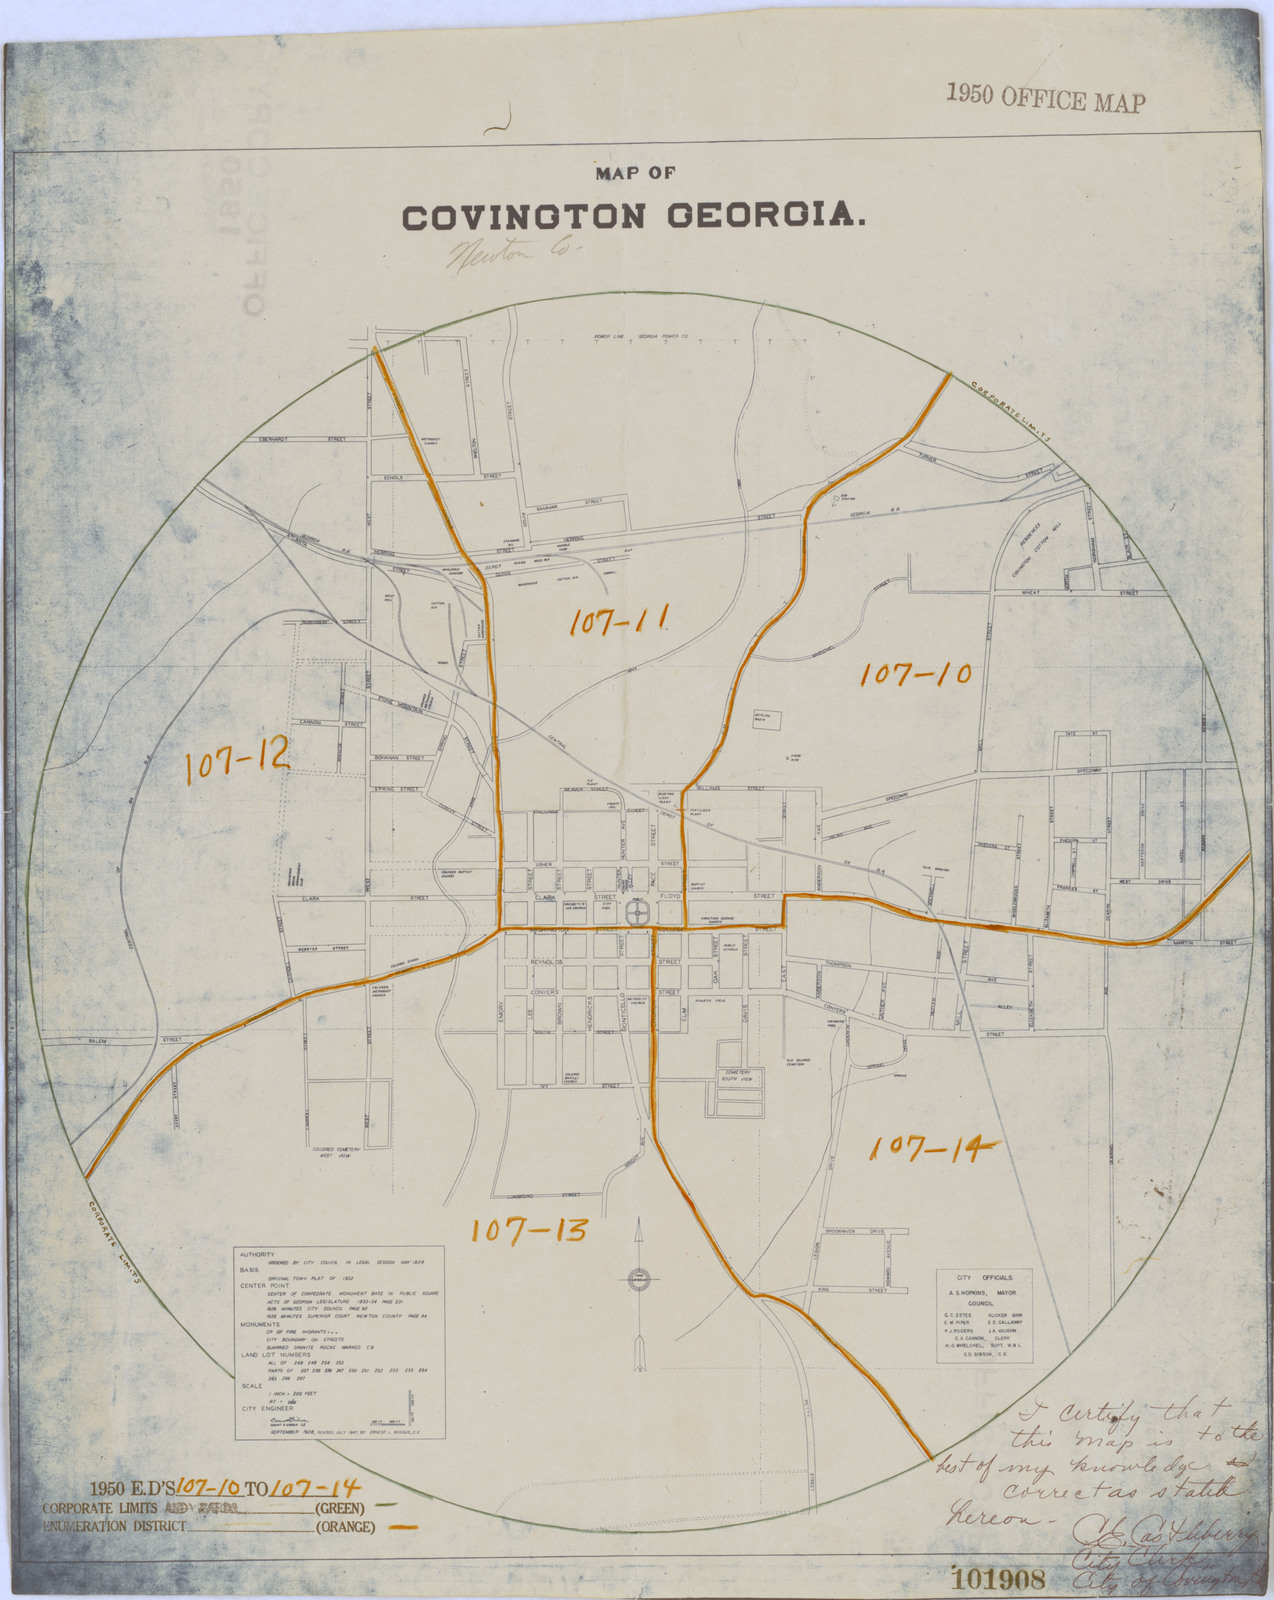 1950 Census Enumeration District Maps - Georgia (GA ... on meridian ga map, narrows ga map, spartanburg ga map, leesville ga map, fairview ga map, kings island ga map, destin ga map, north macon ga map, houston ga map, forest hill ga map, new orleans ga map, snapfinger ga map, hartsfield ga map, hardeeville ga map, north metro ga map, fayetteville ga map, vista grove ga map, mill creek ga map, south fulton ga map, gainesville ga map,